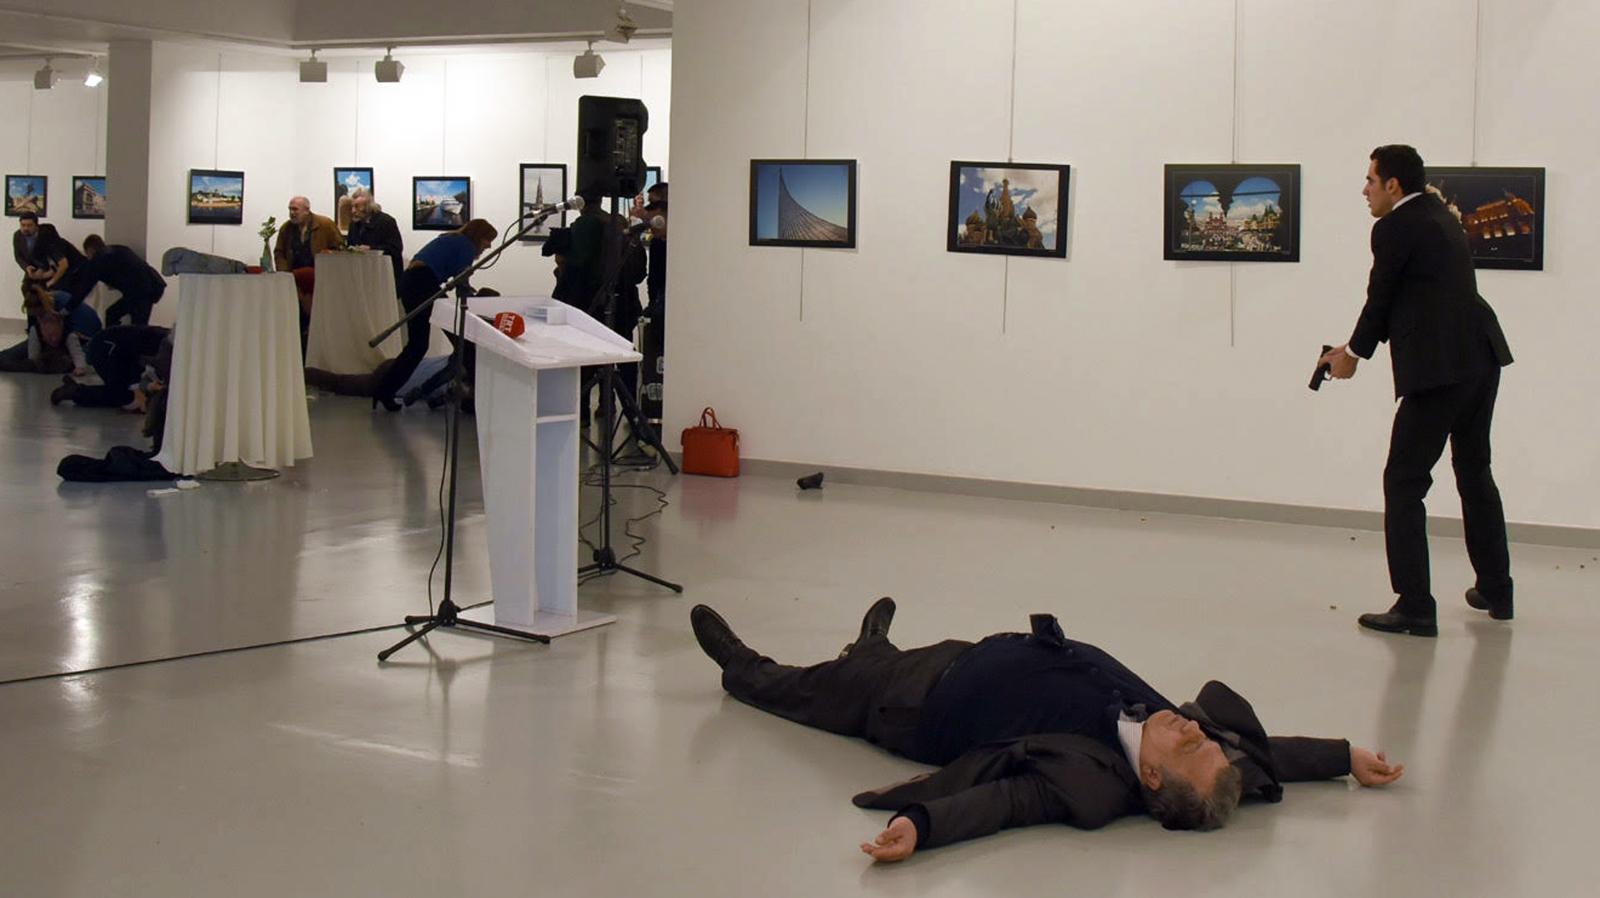 ambasciatore russo